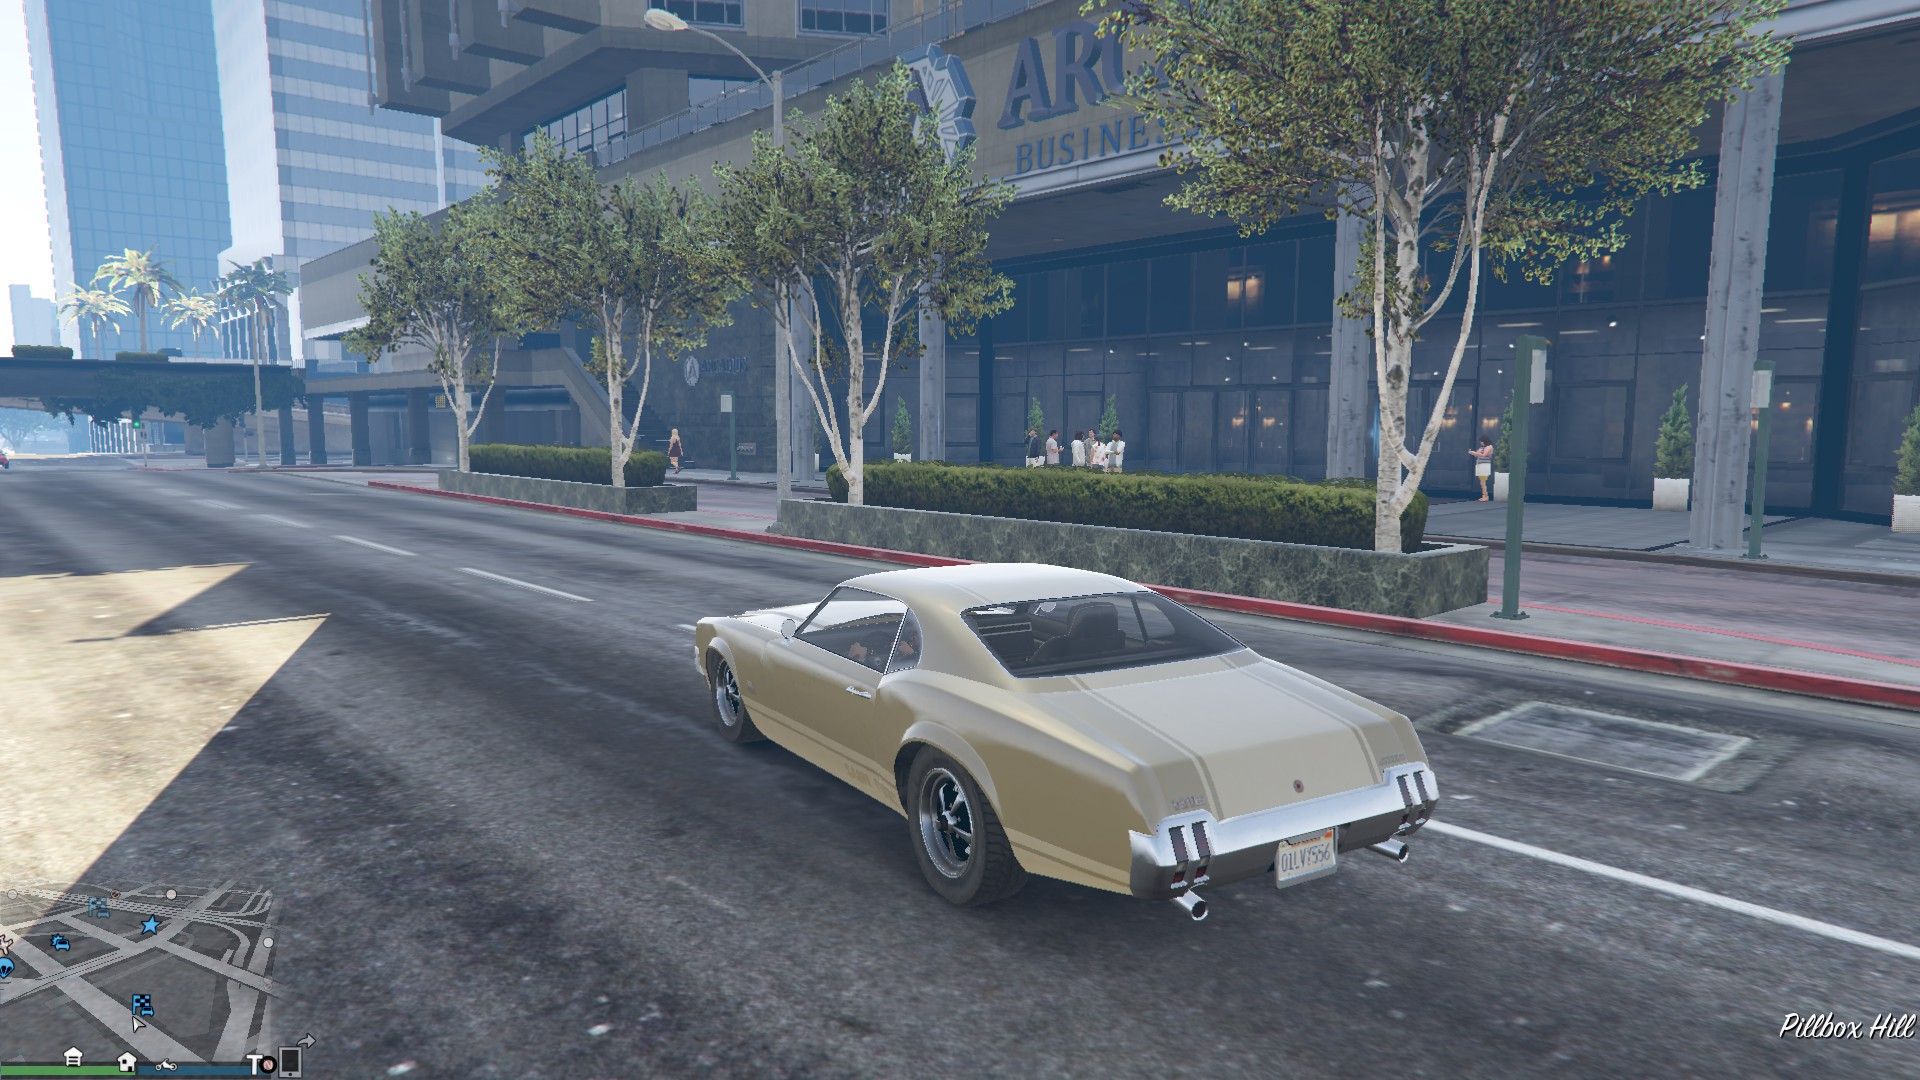 The car I stole